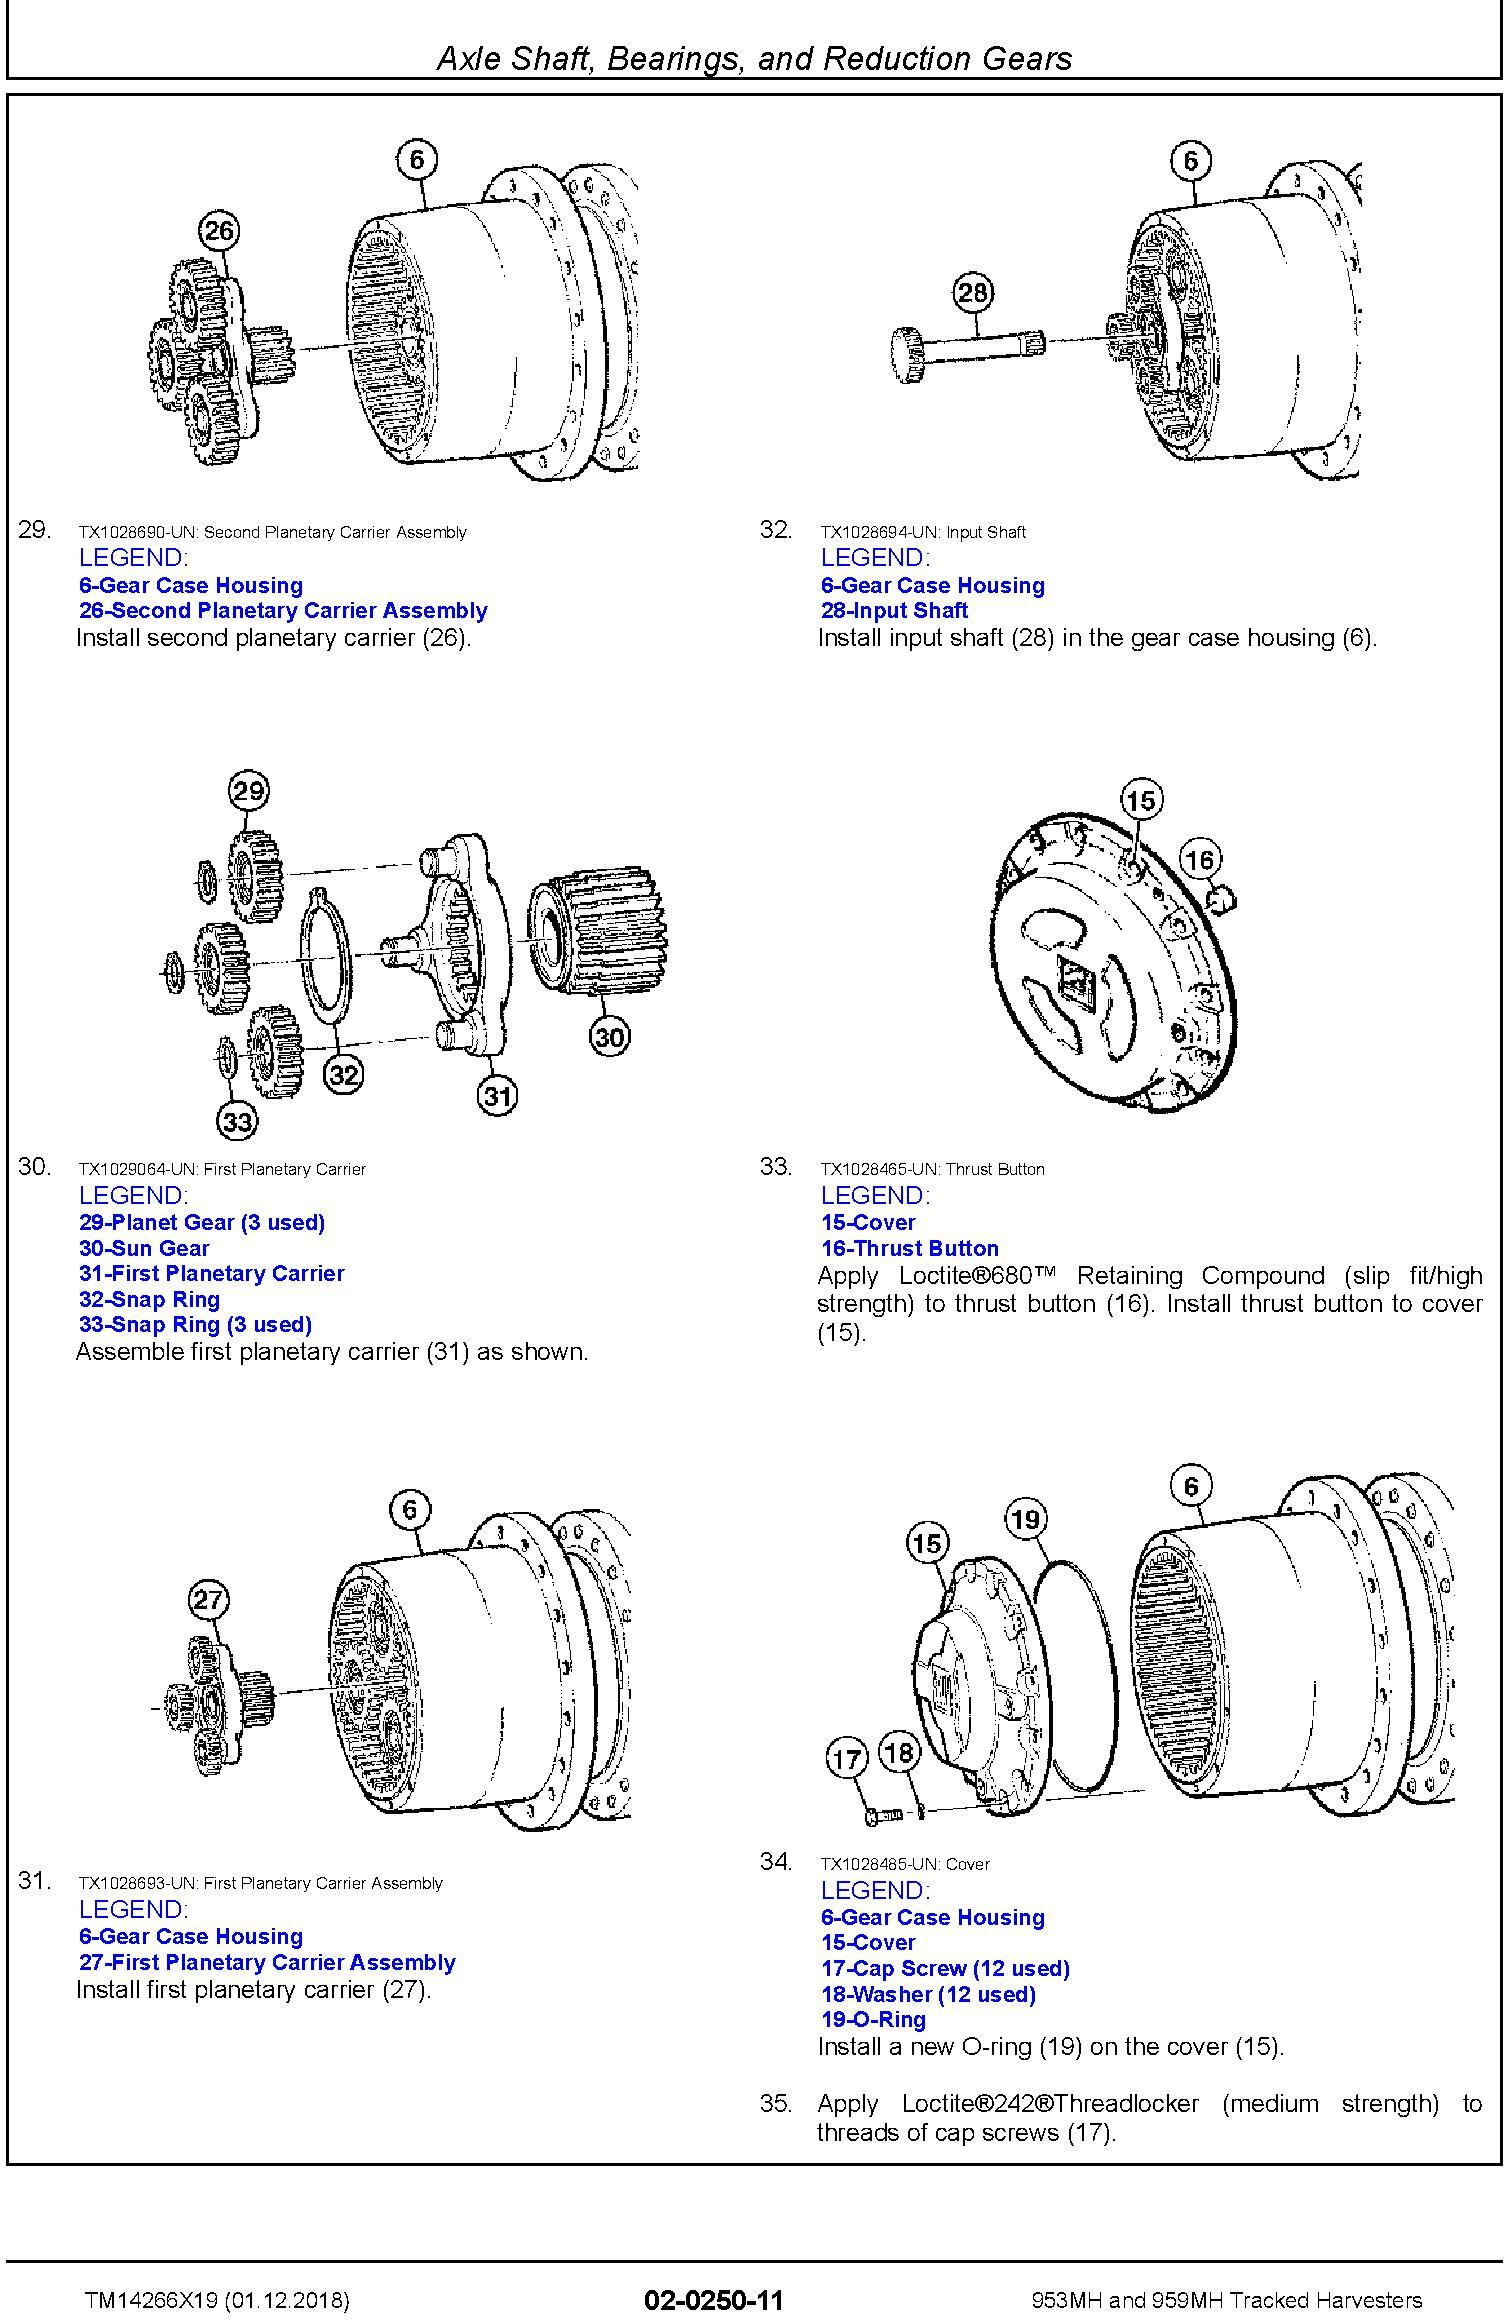 John Deere 953MH, 959MH (SN.F317982-,L317982-) Tracked Harvesters Service Repair Manual (TM14266X19) - 2